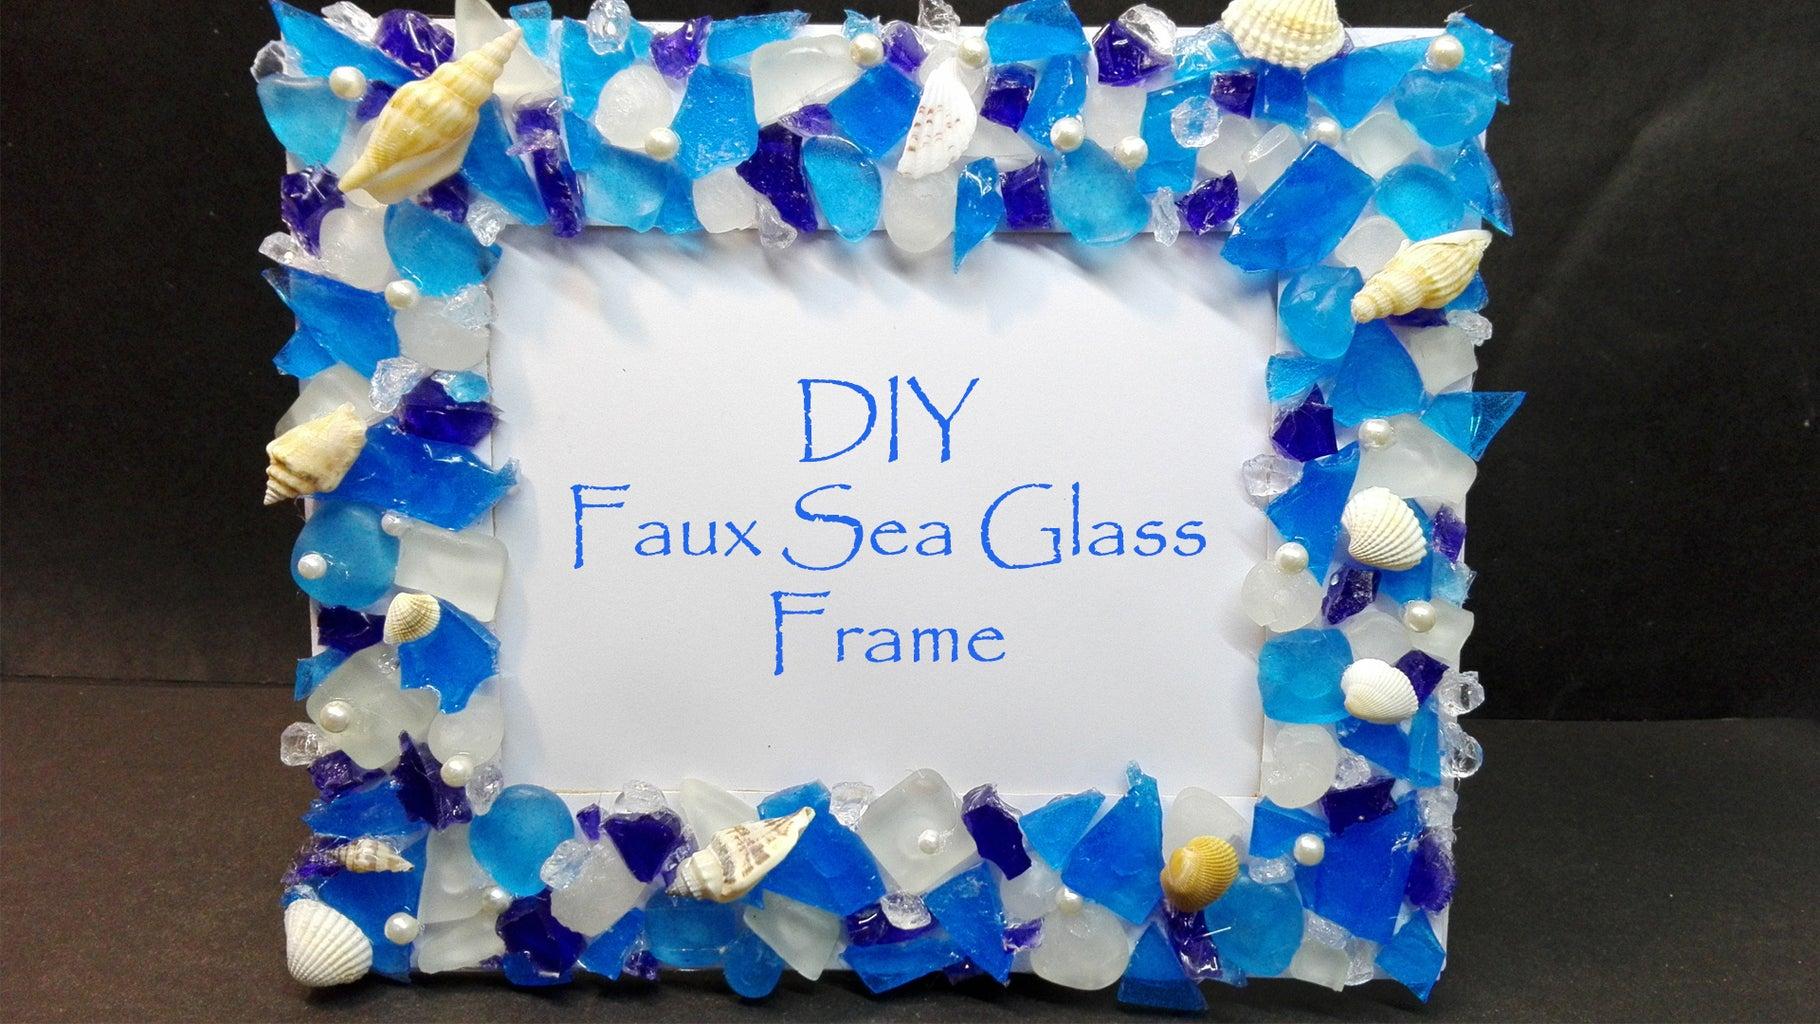 DIY Faux Sea Glass Frame